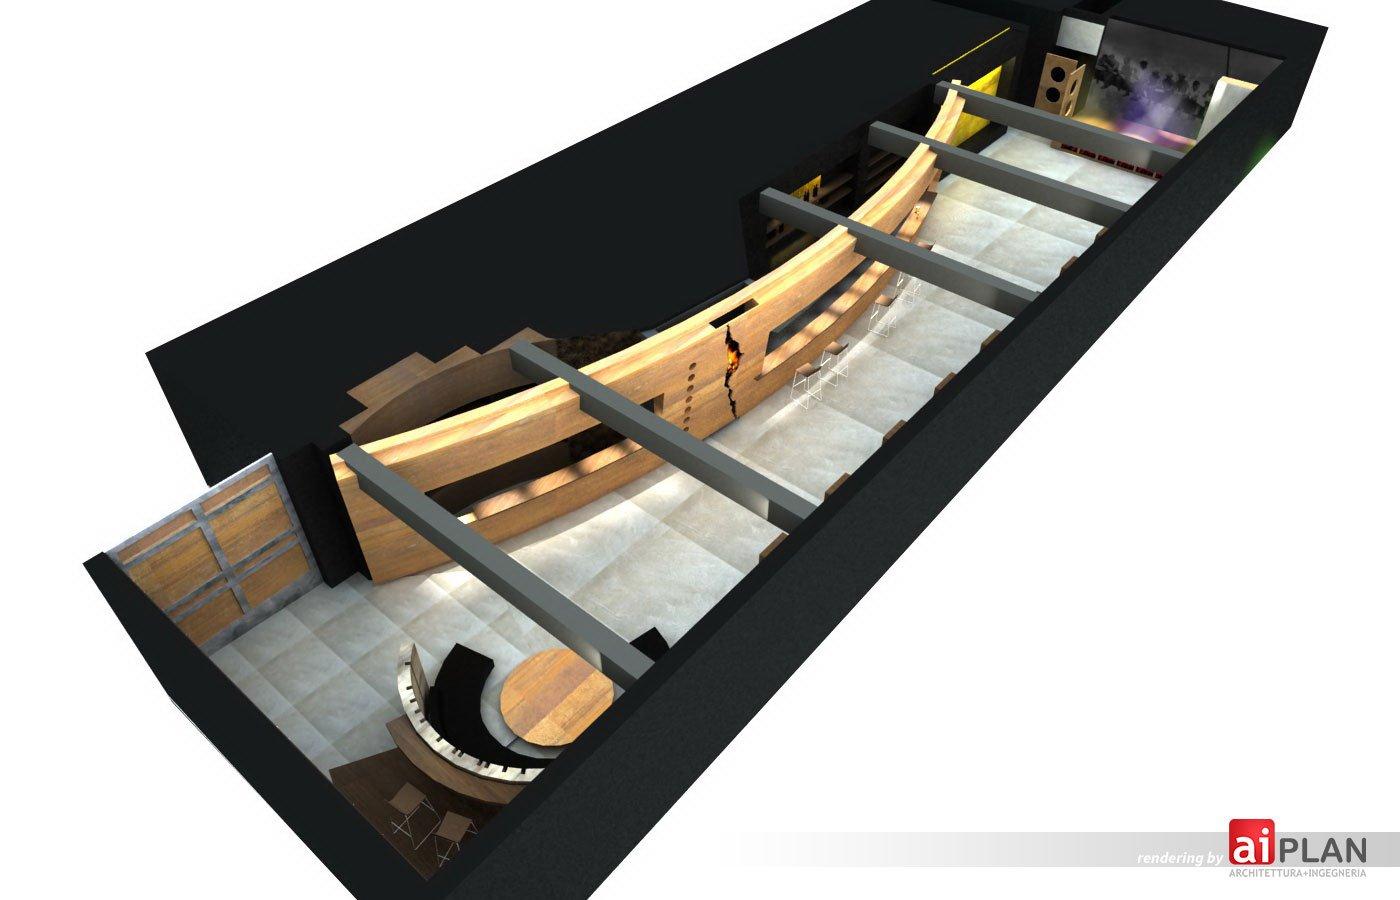 Planimetrie 3d sezioni e spaccati 3d aiplan for Architettura 3d